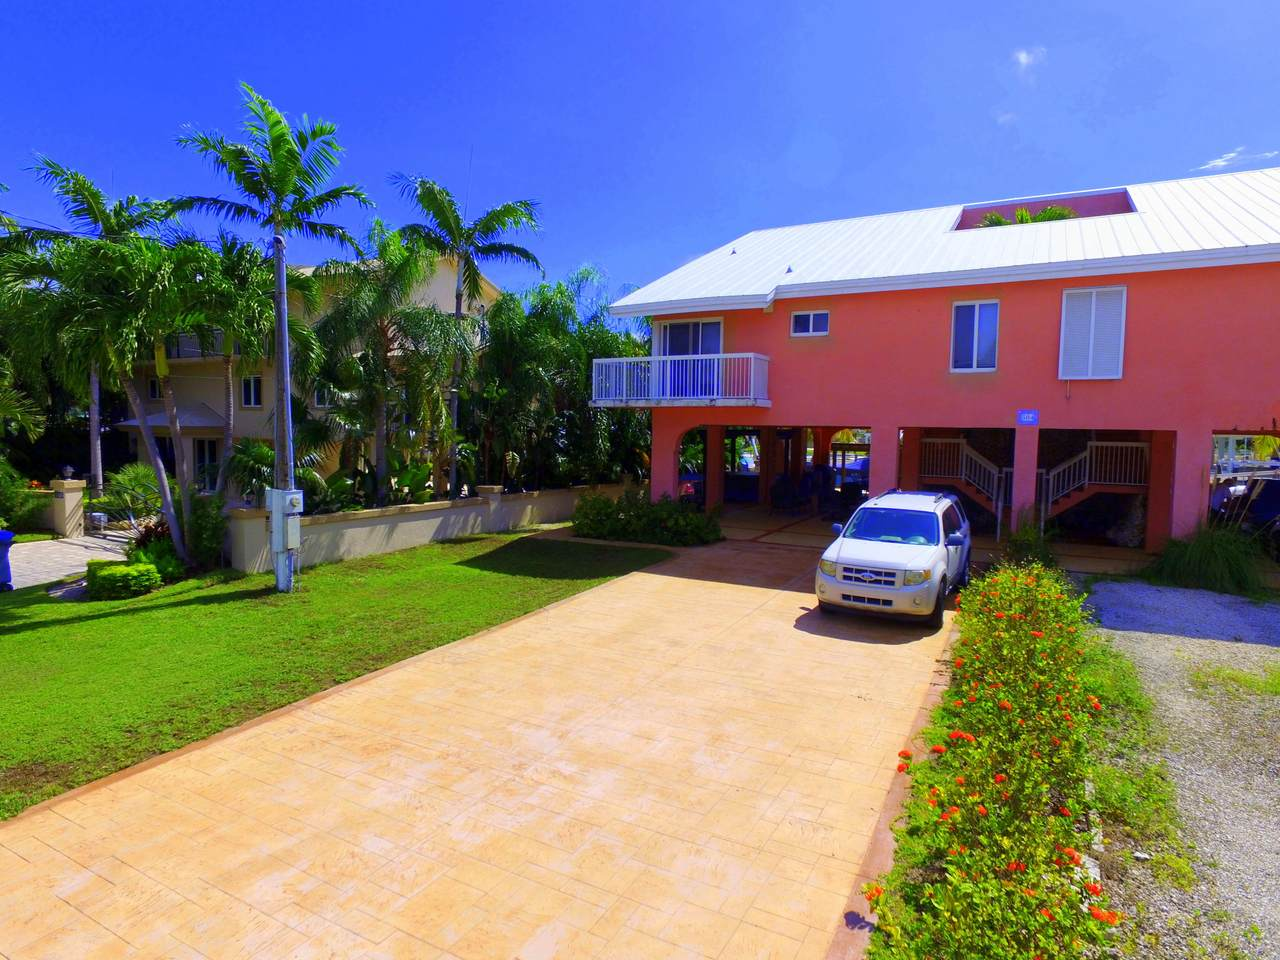 504 Caribbean Drive - Photo 1